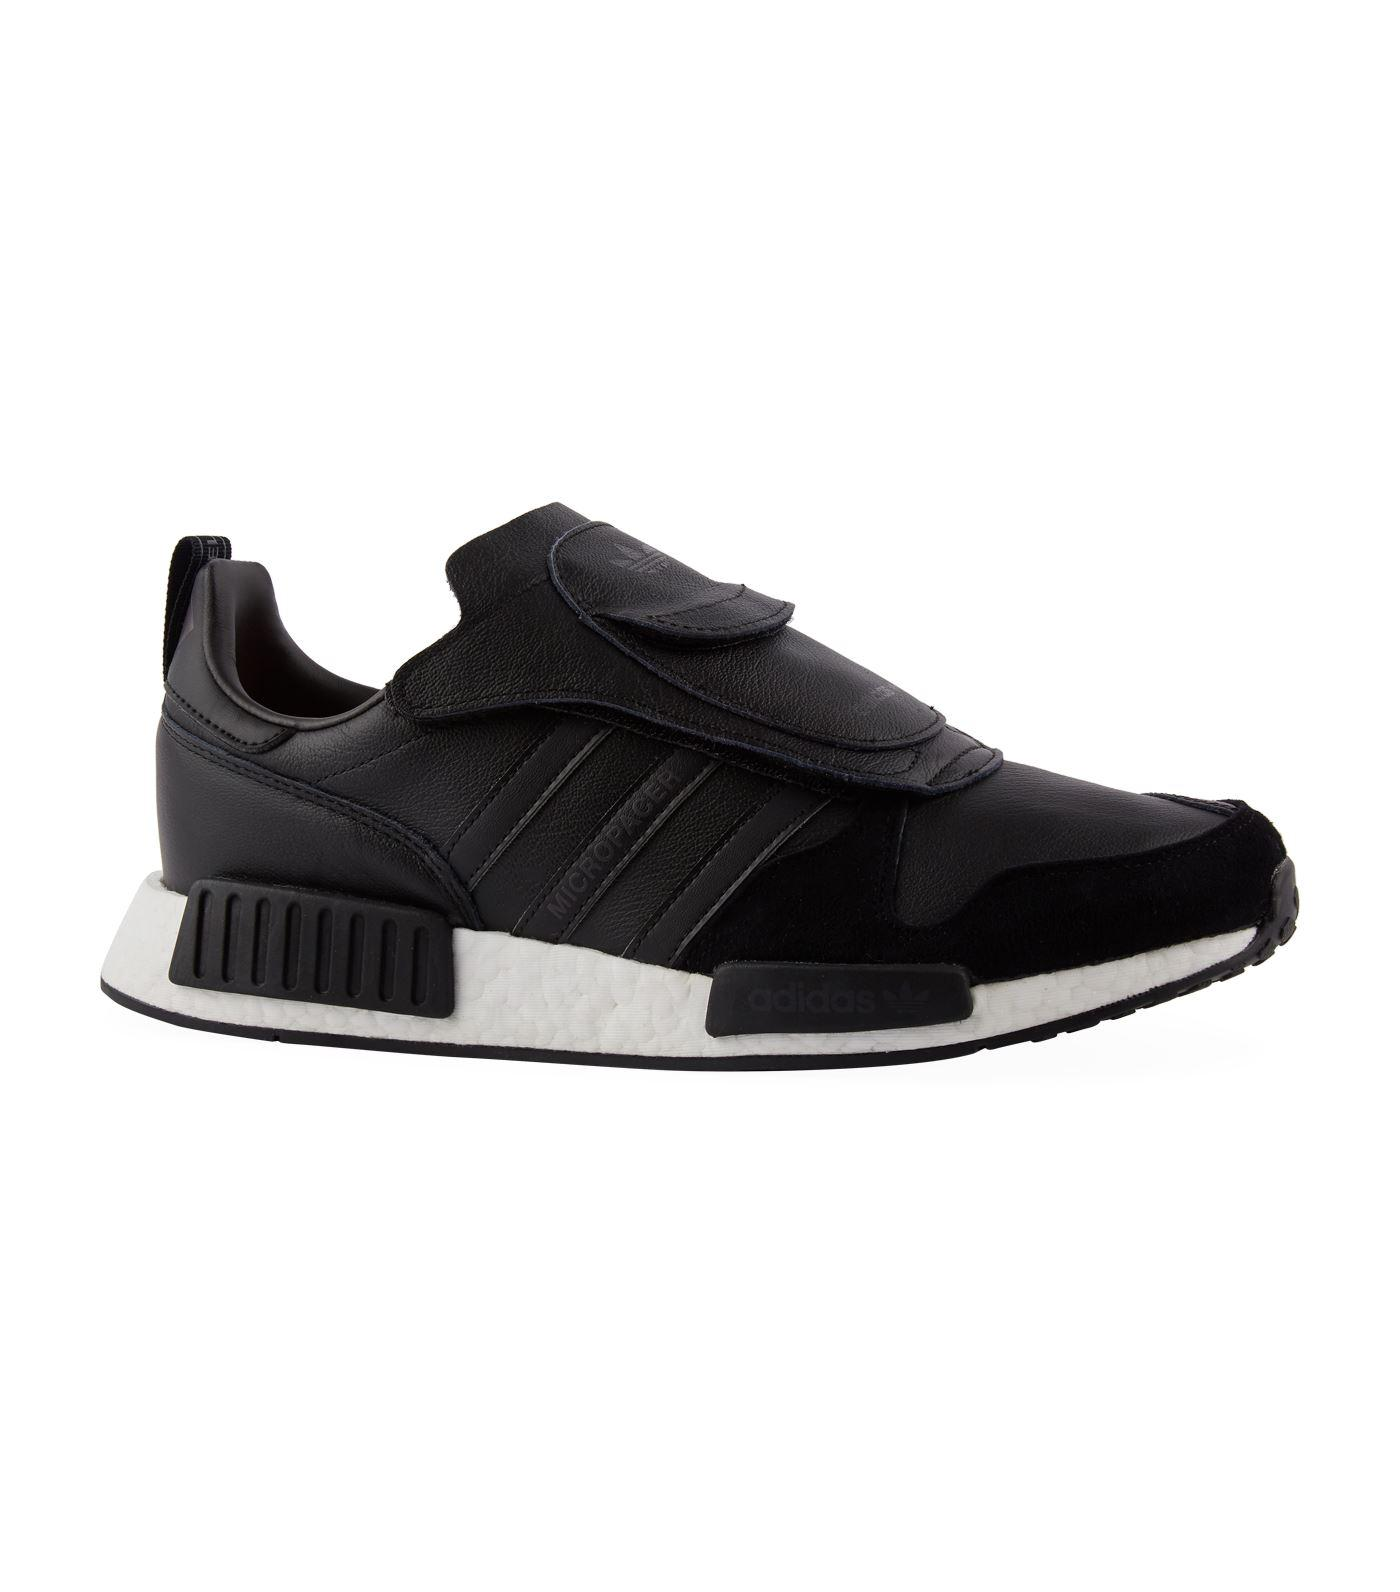 sale retailer 4efe9 ba50c Adidas Originals Black Micropacer Xr1 Sneakers for men